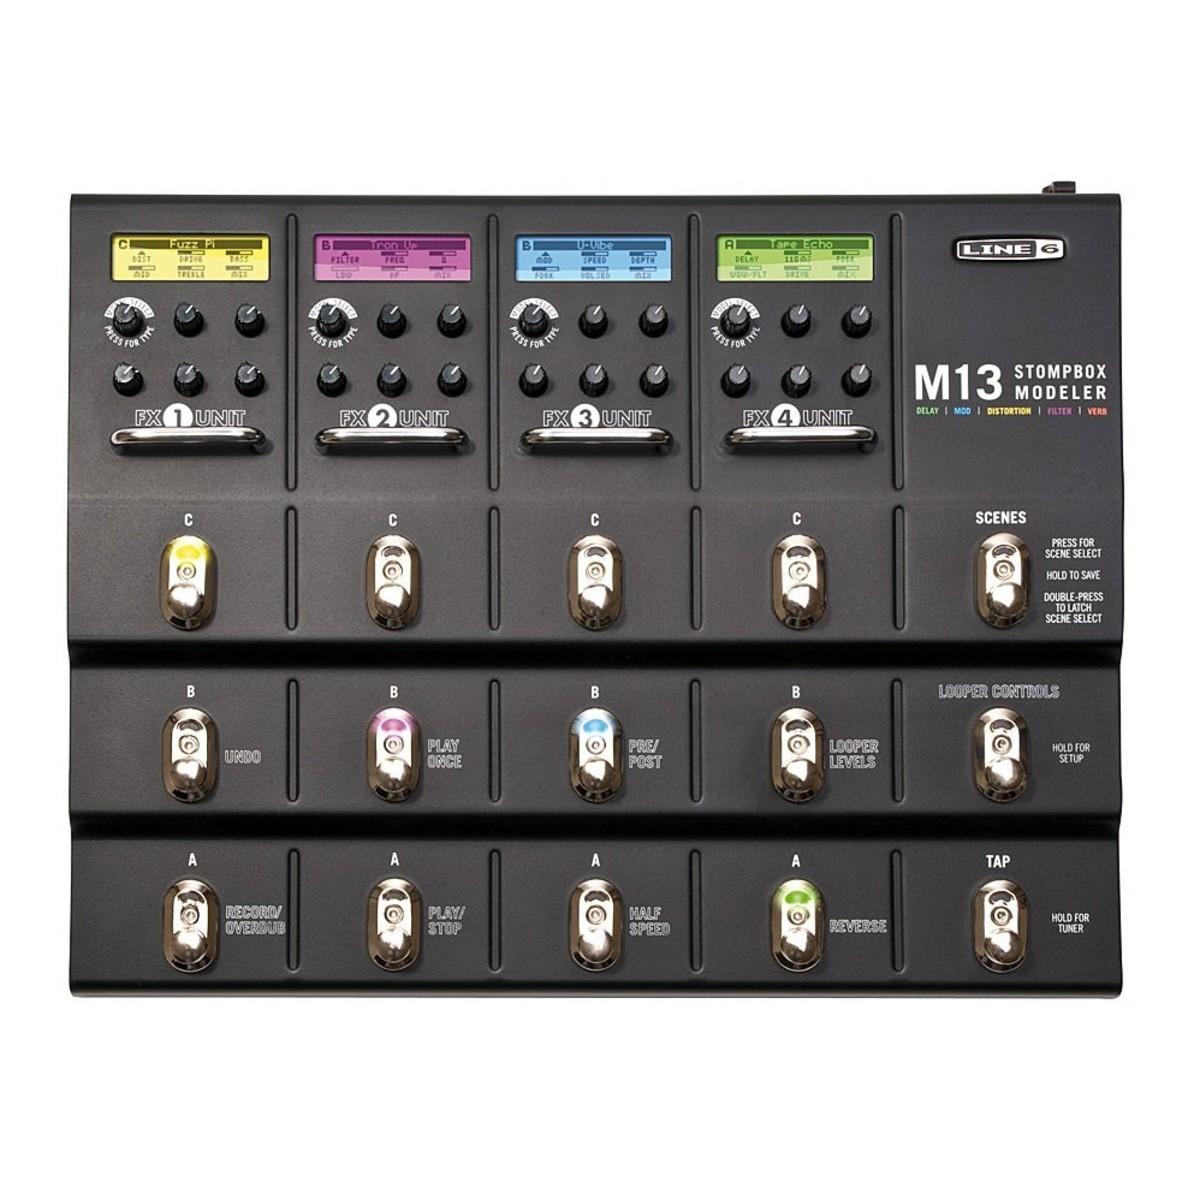 Line 6 M13 Stompbox Modeler Multi Effects Pedal 1